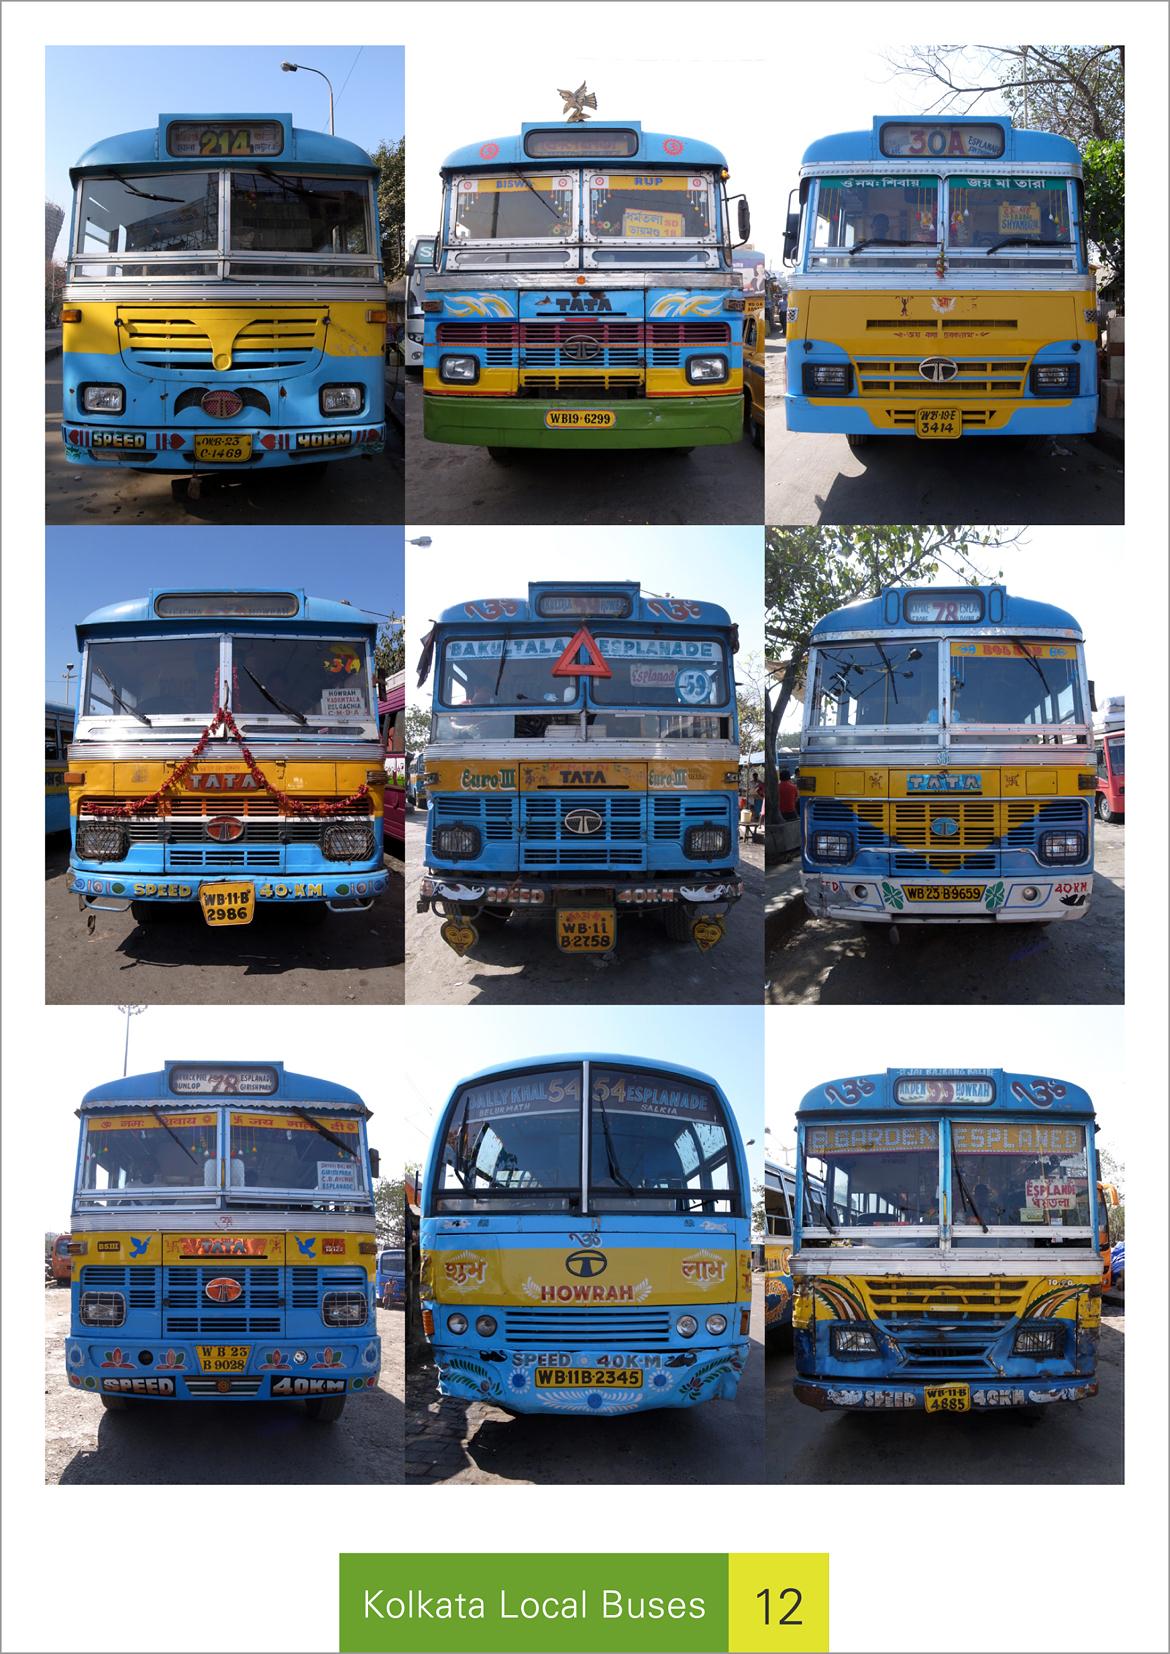 KolkataLocalBus-12.jpg